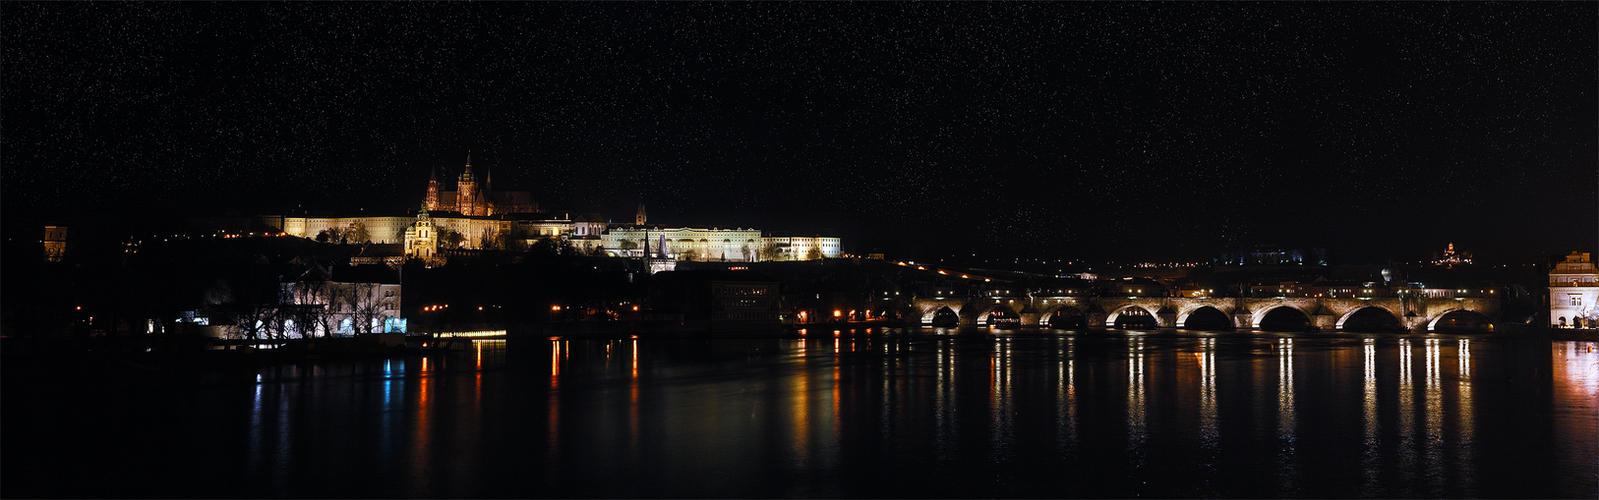 Night Prague by Holowood